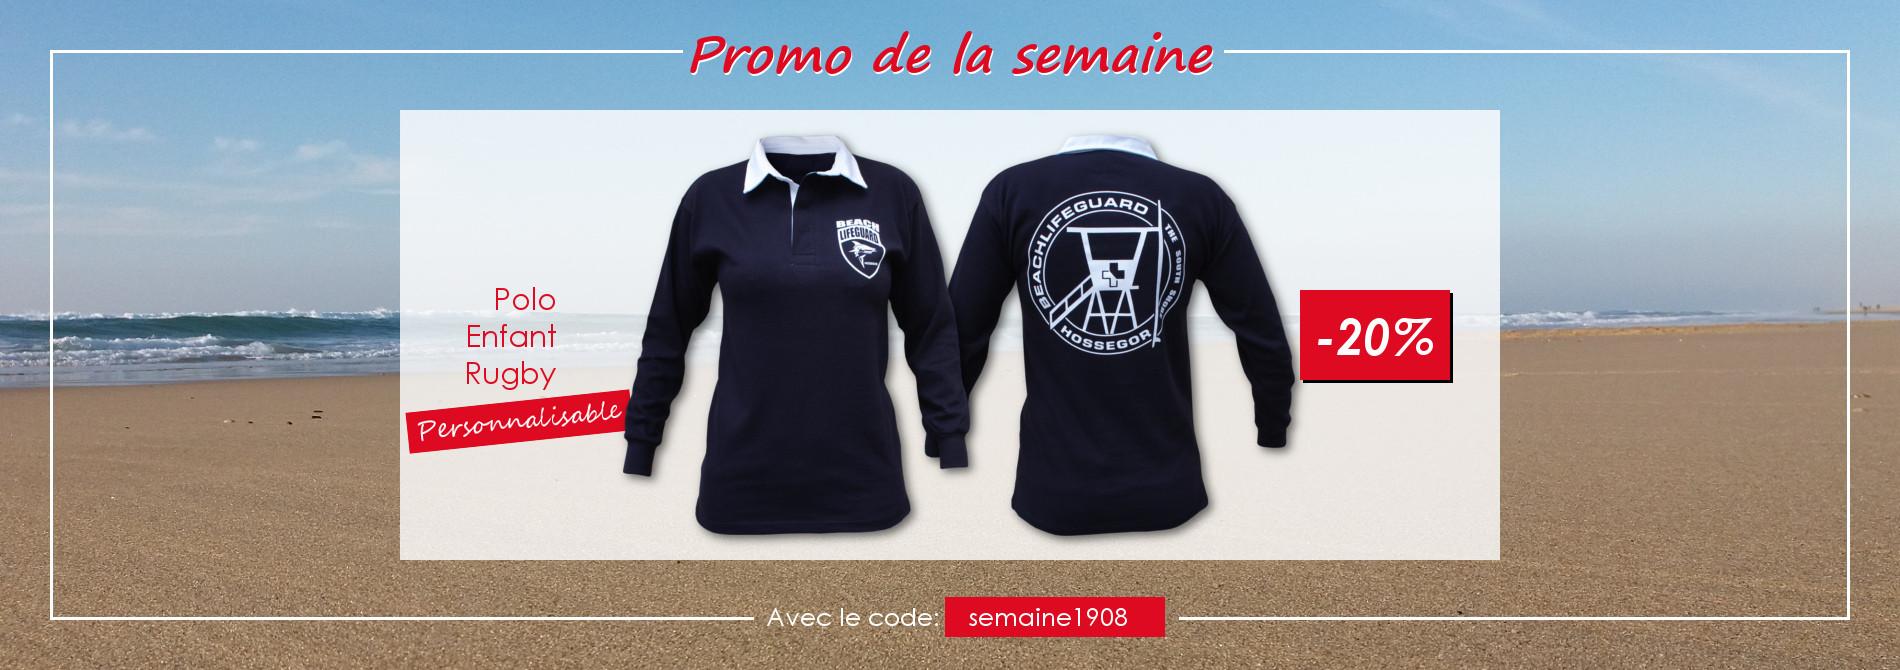 2019 08 19 Polo Rugby Enfant